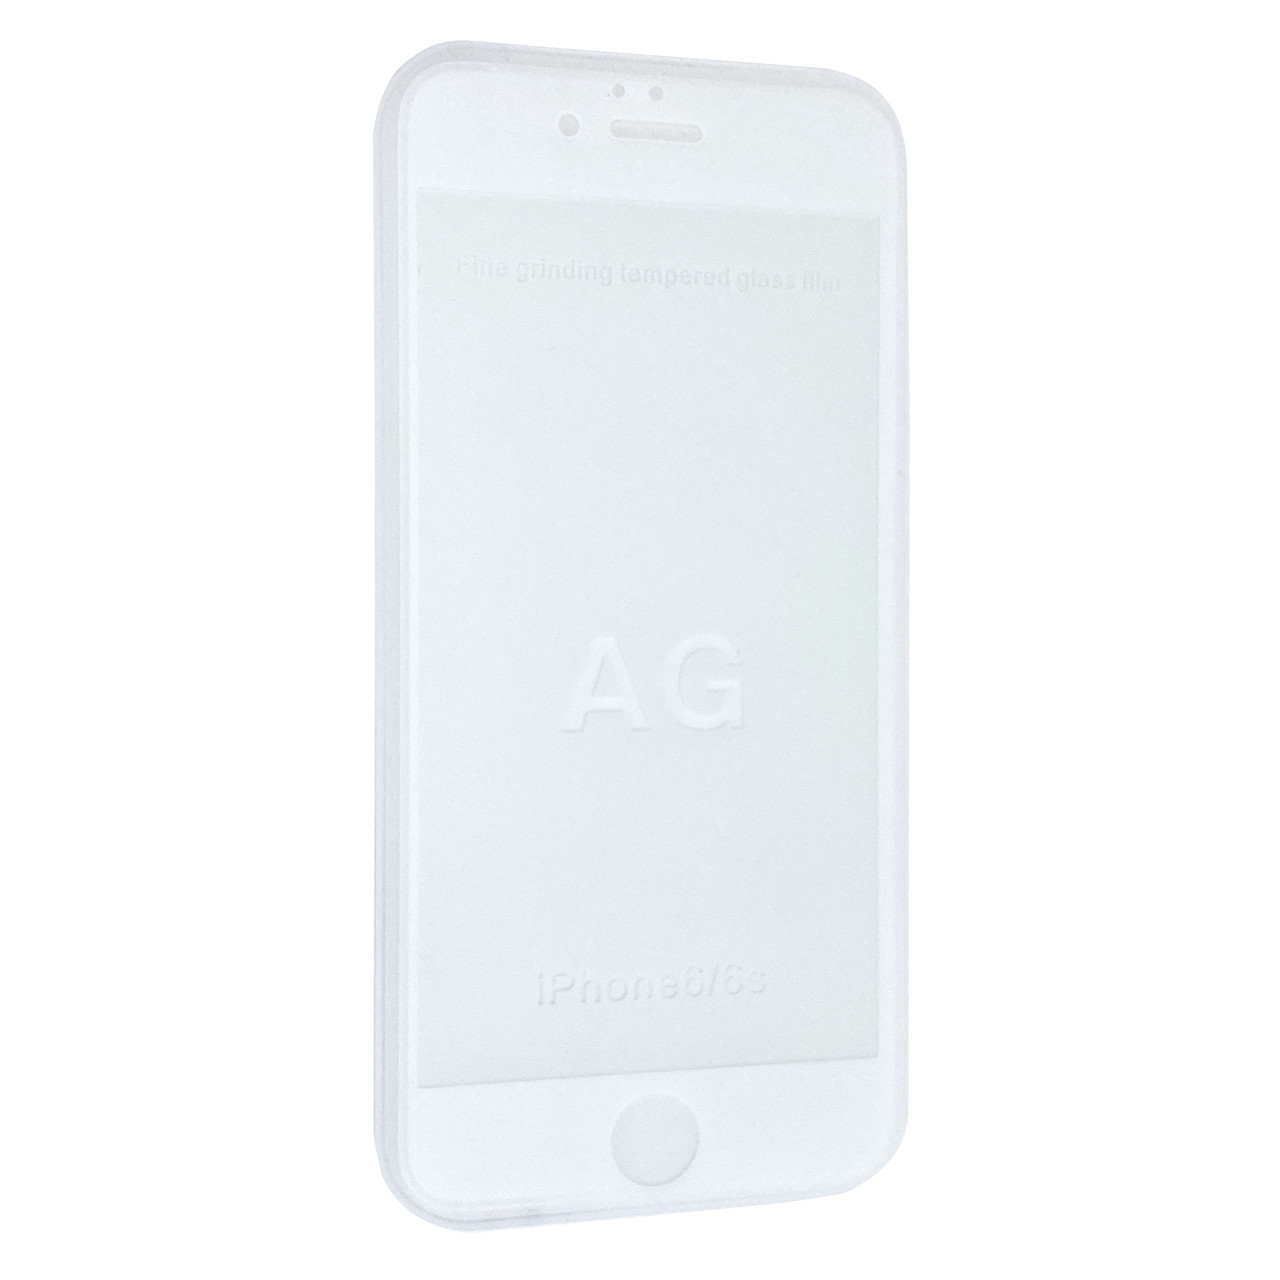 Защитное стекло  весь экран matt for Apple iPhone 6/6S front (white)